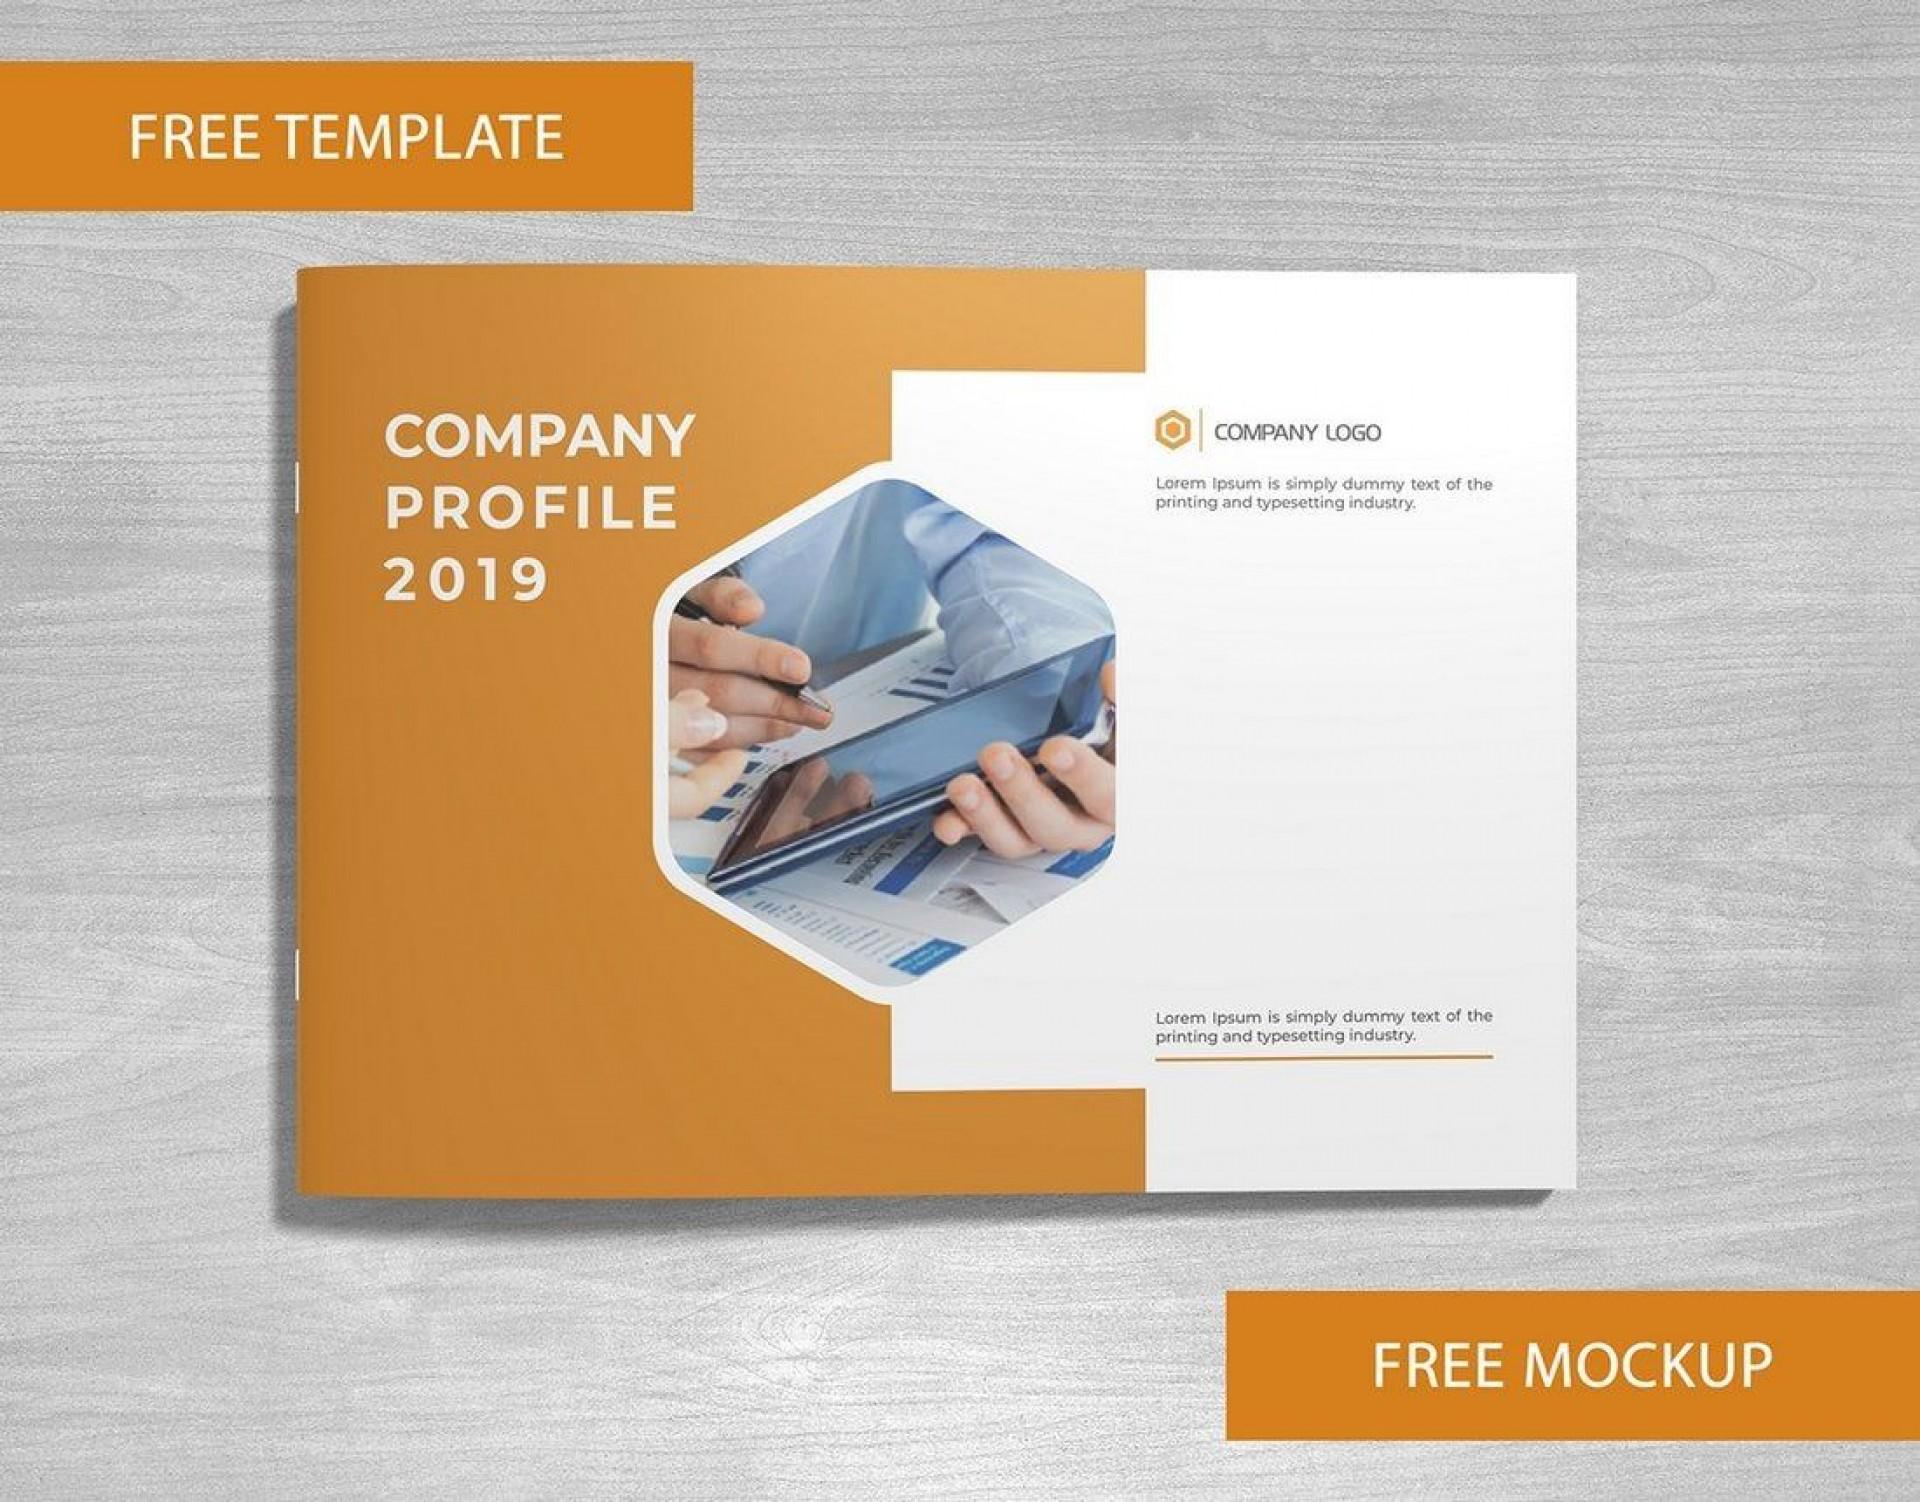 005 Rare Corporate Brochure Design Template Psd Free Download Inspiration  Tri Fold Hotel1920